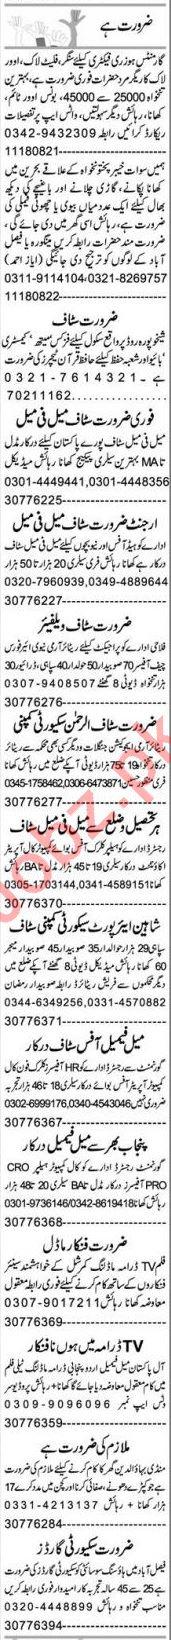 Express Sunday Faisalabad Classified Ads 20 June 2021